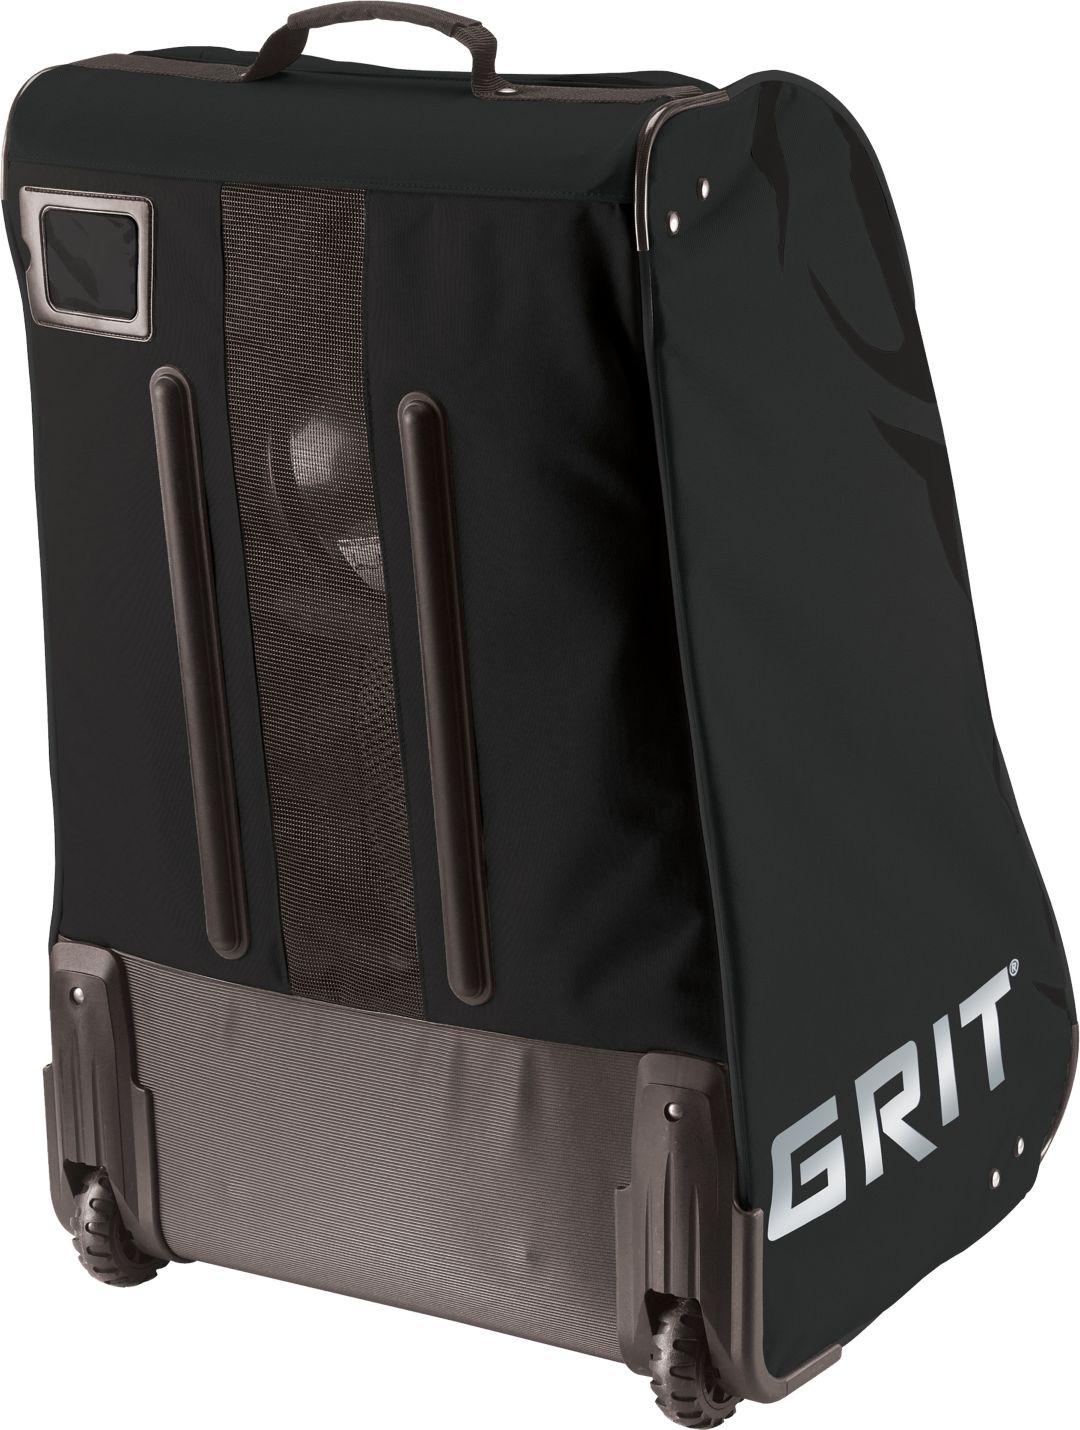 Grit Hyfx 30 Hockey Tower Wheel Bag